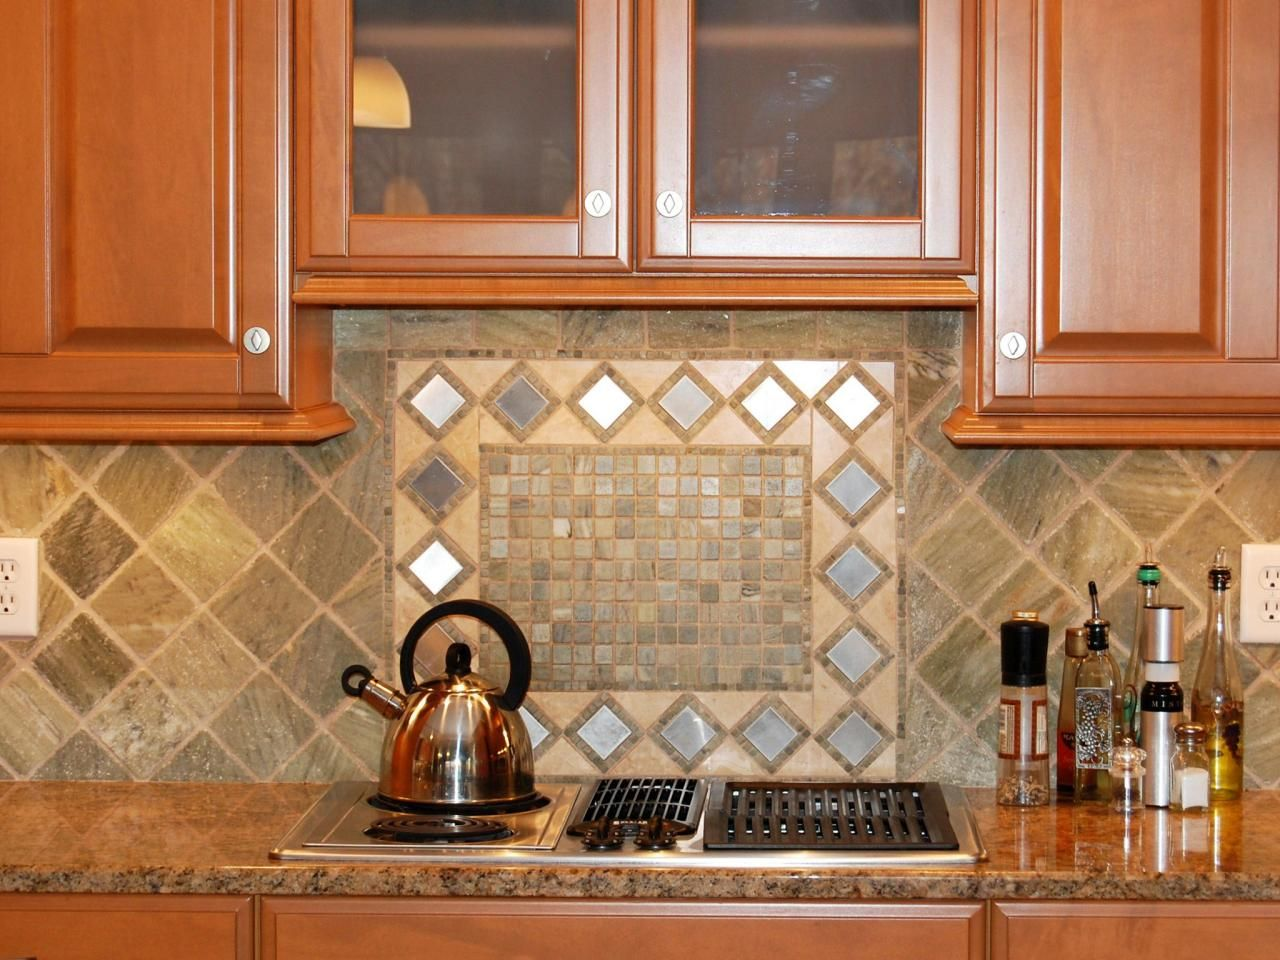 glass tile backsplashes | kitchen backsplash and backsplash ideas